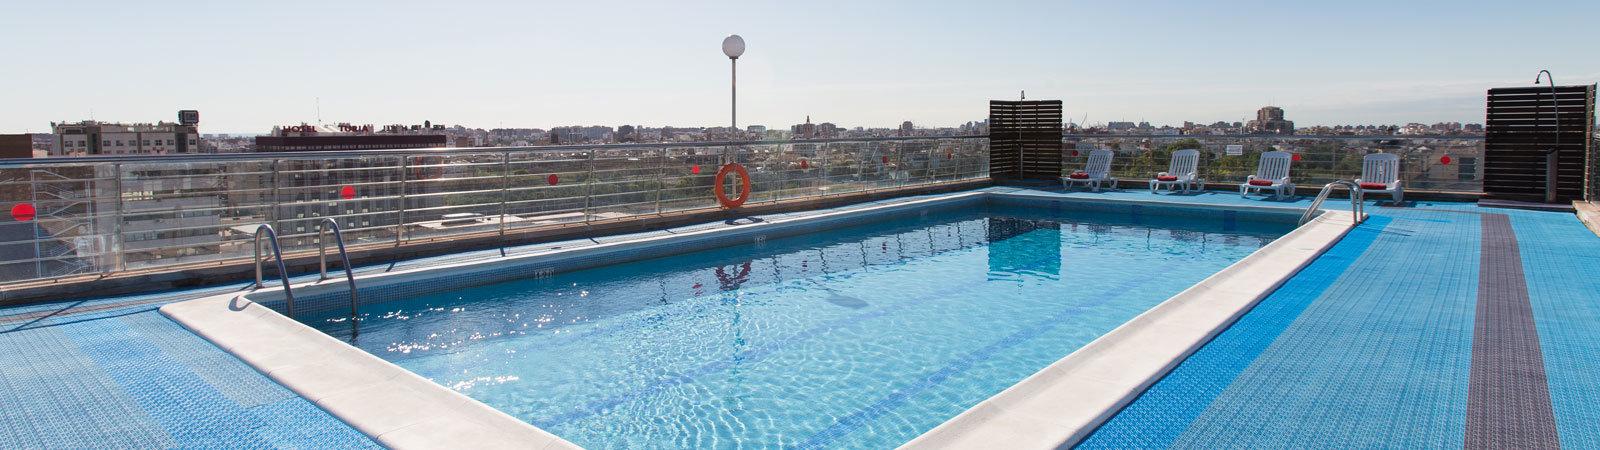 piscina-slider-expohotel-valencia